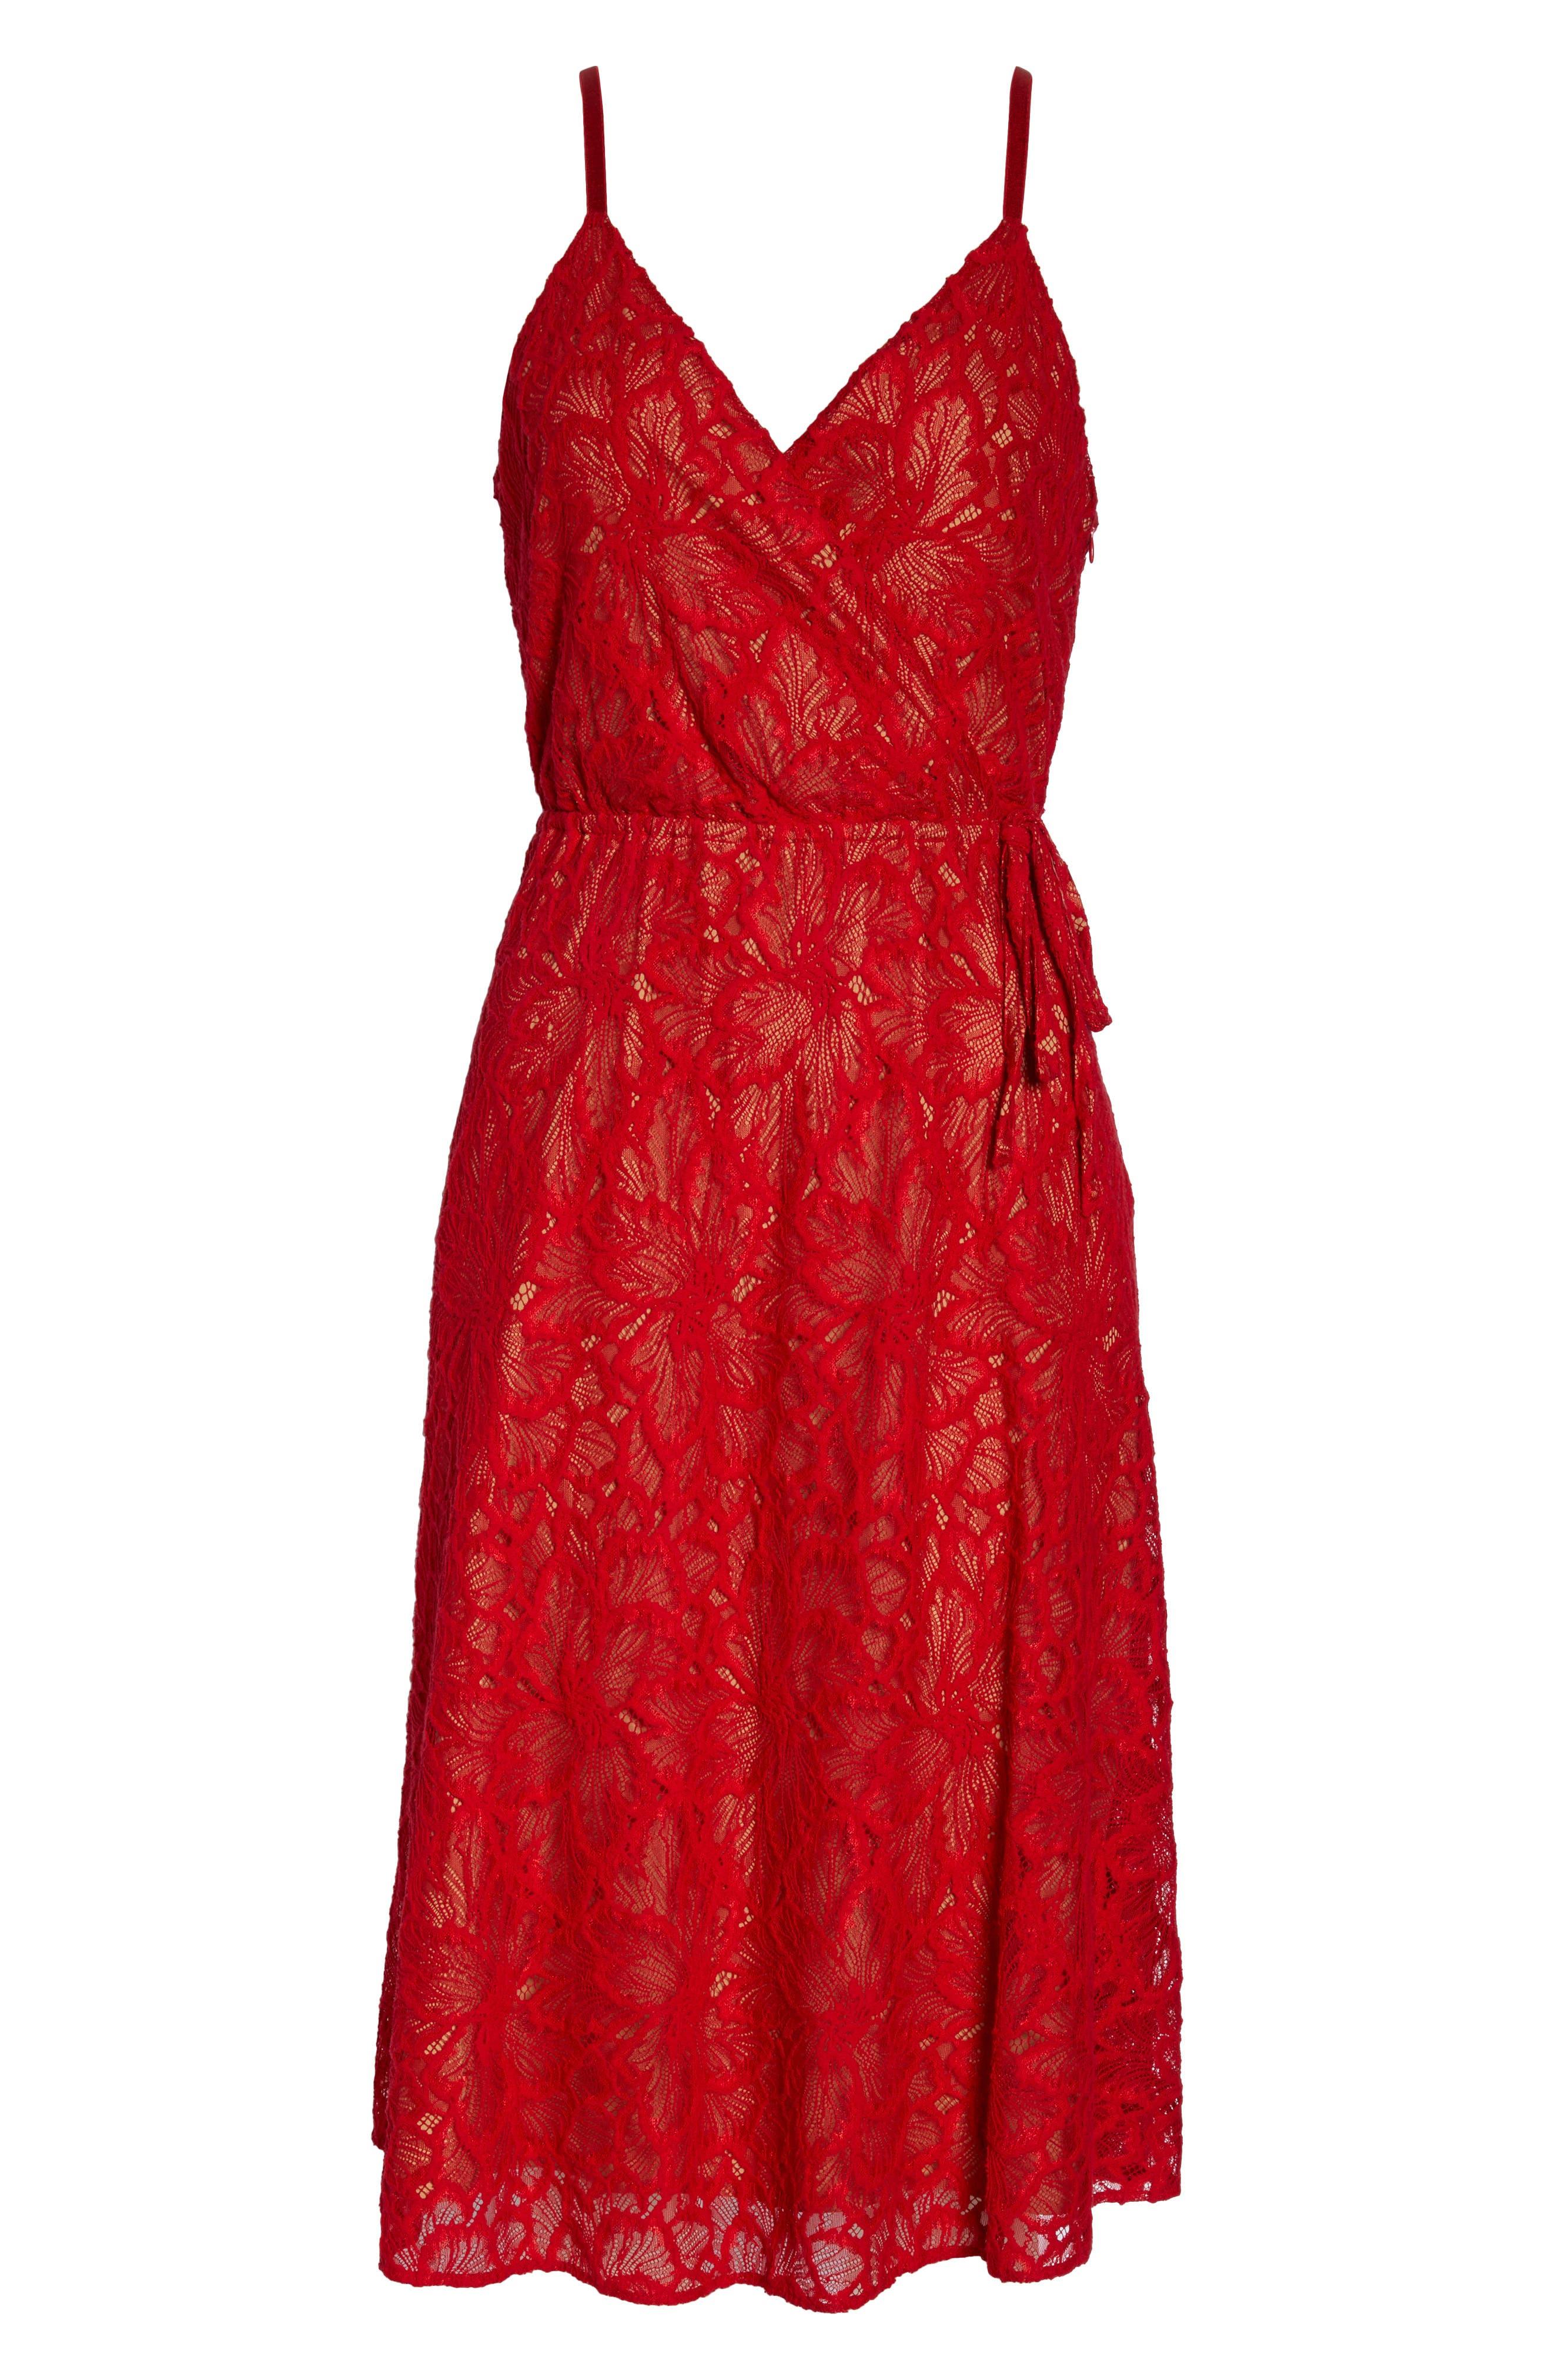 ALI & JAY,                             Cheek to Cheek Lace Midi Dress,                             Alternate thumbnail 7, color,                             SCARLET